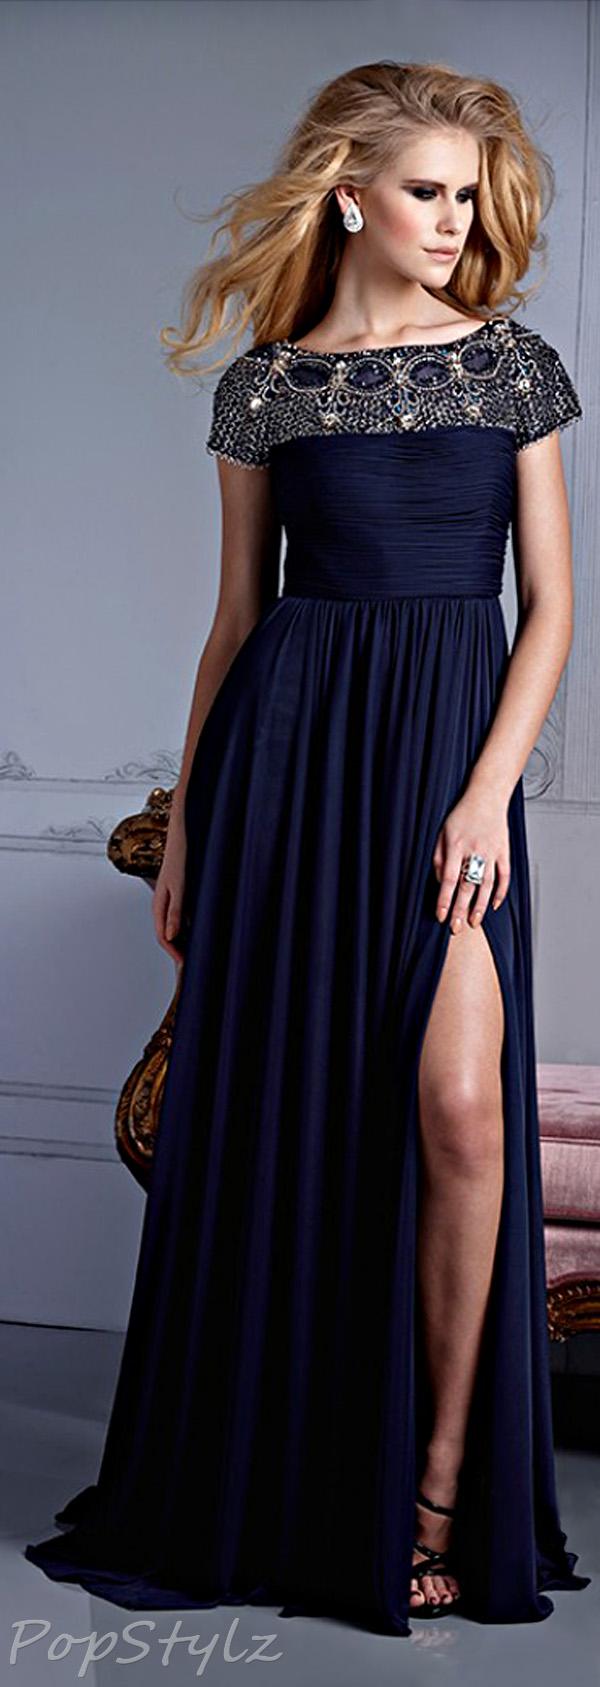 Terani Couture M2214 Evening Fall 2013 Dress